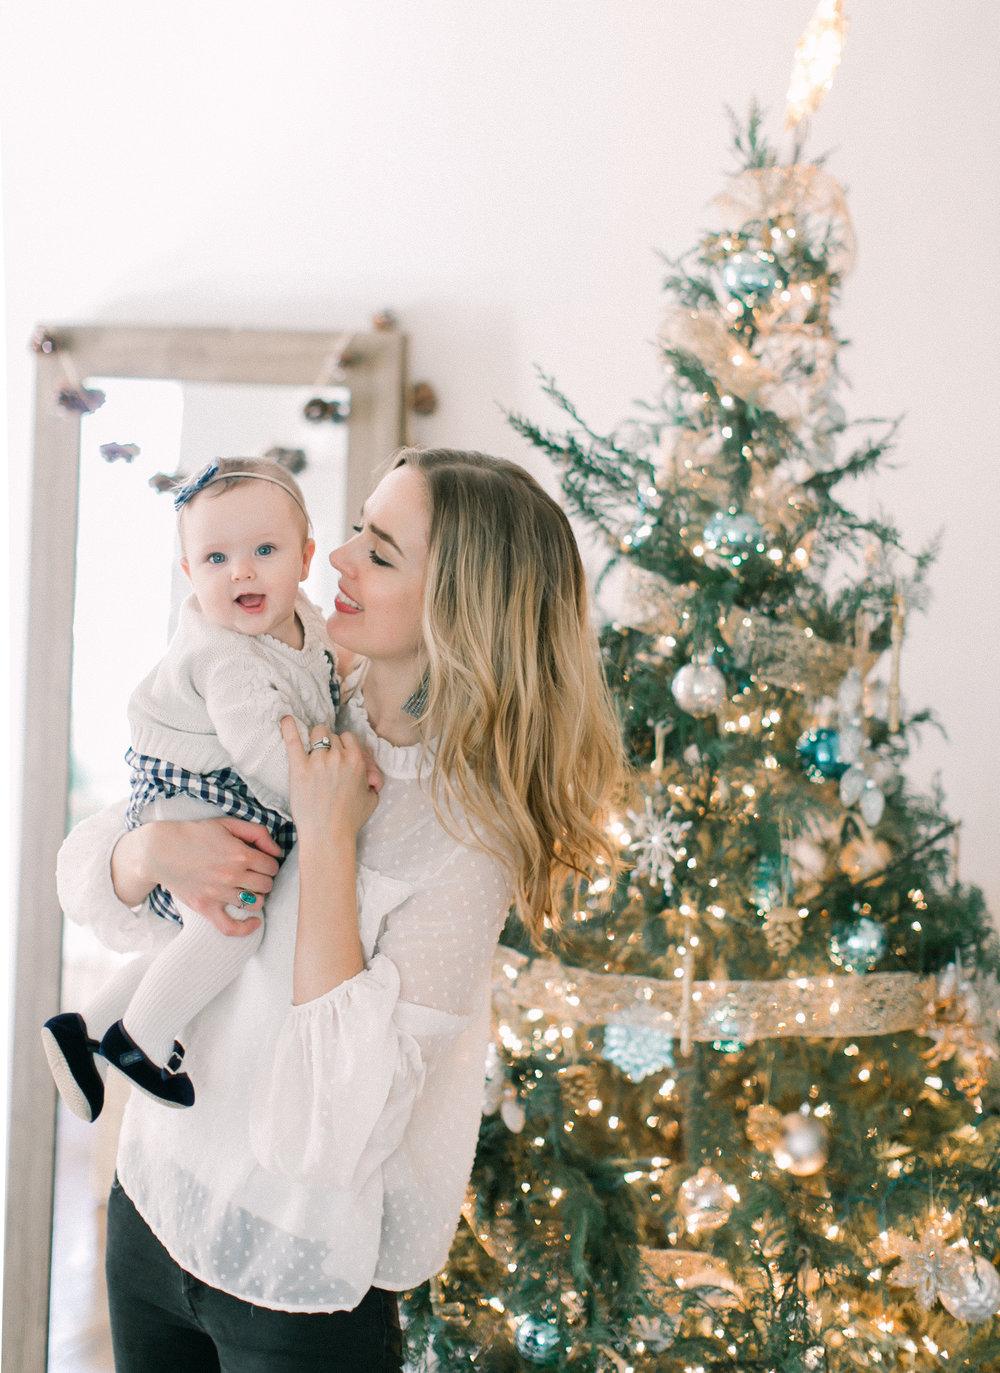 Christmas2017-1010.jpg